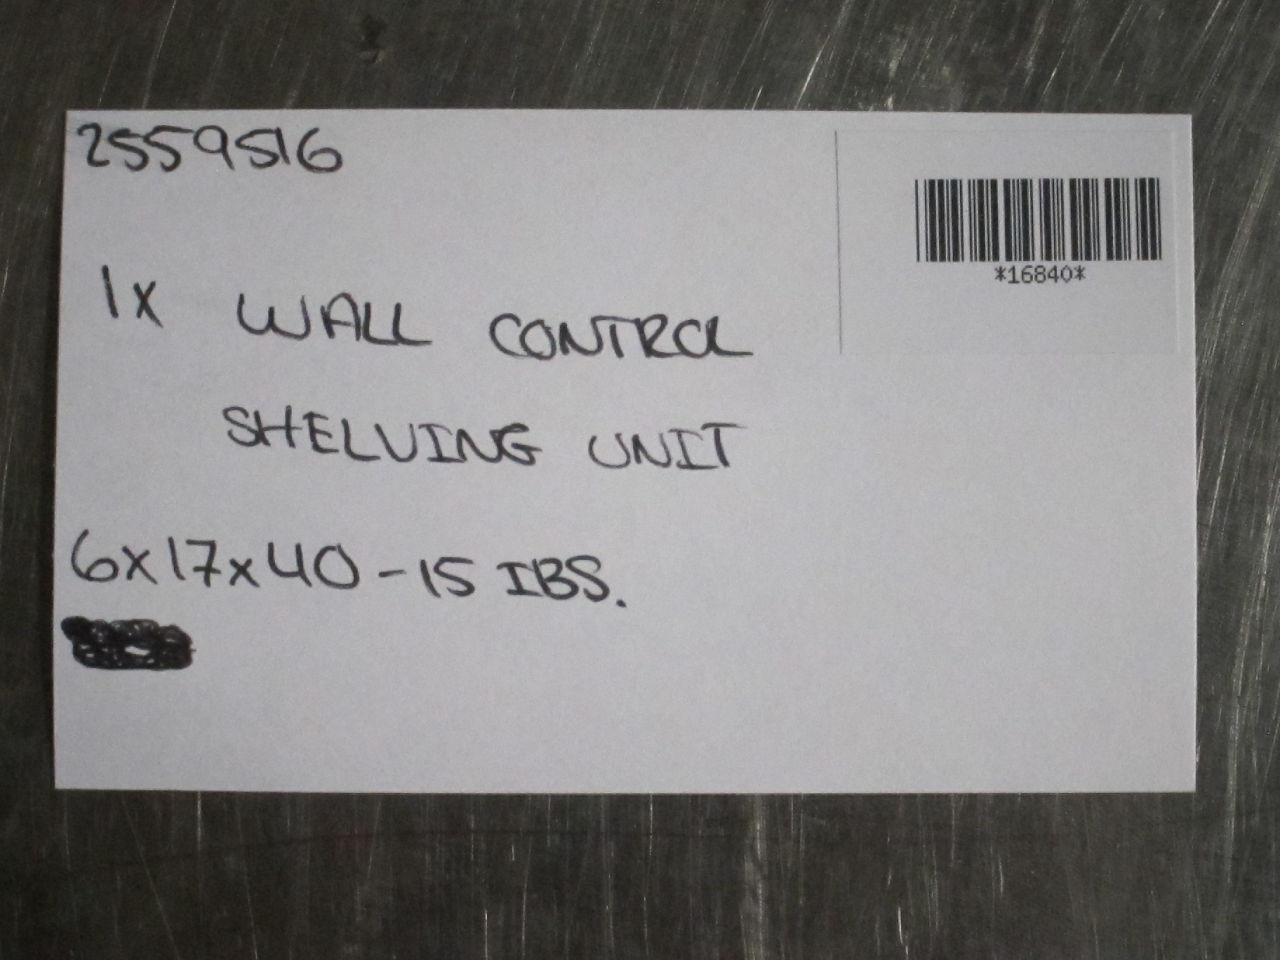 Wall Control